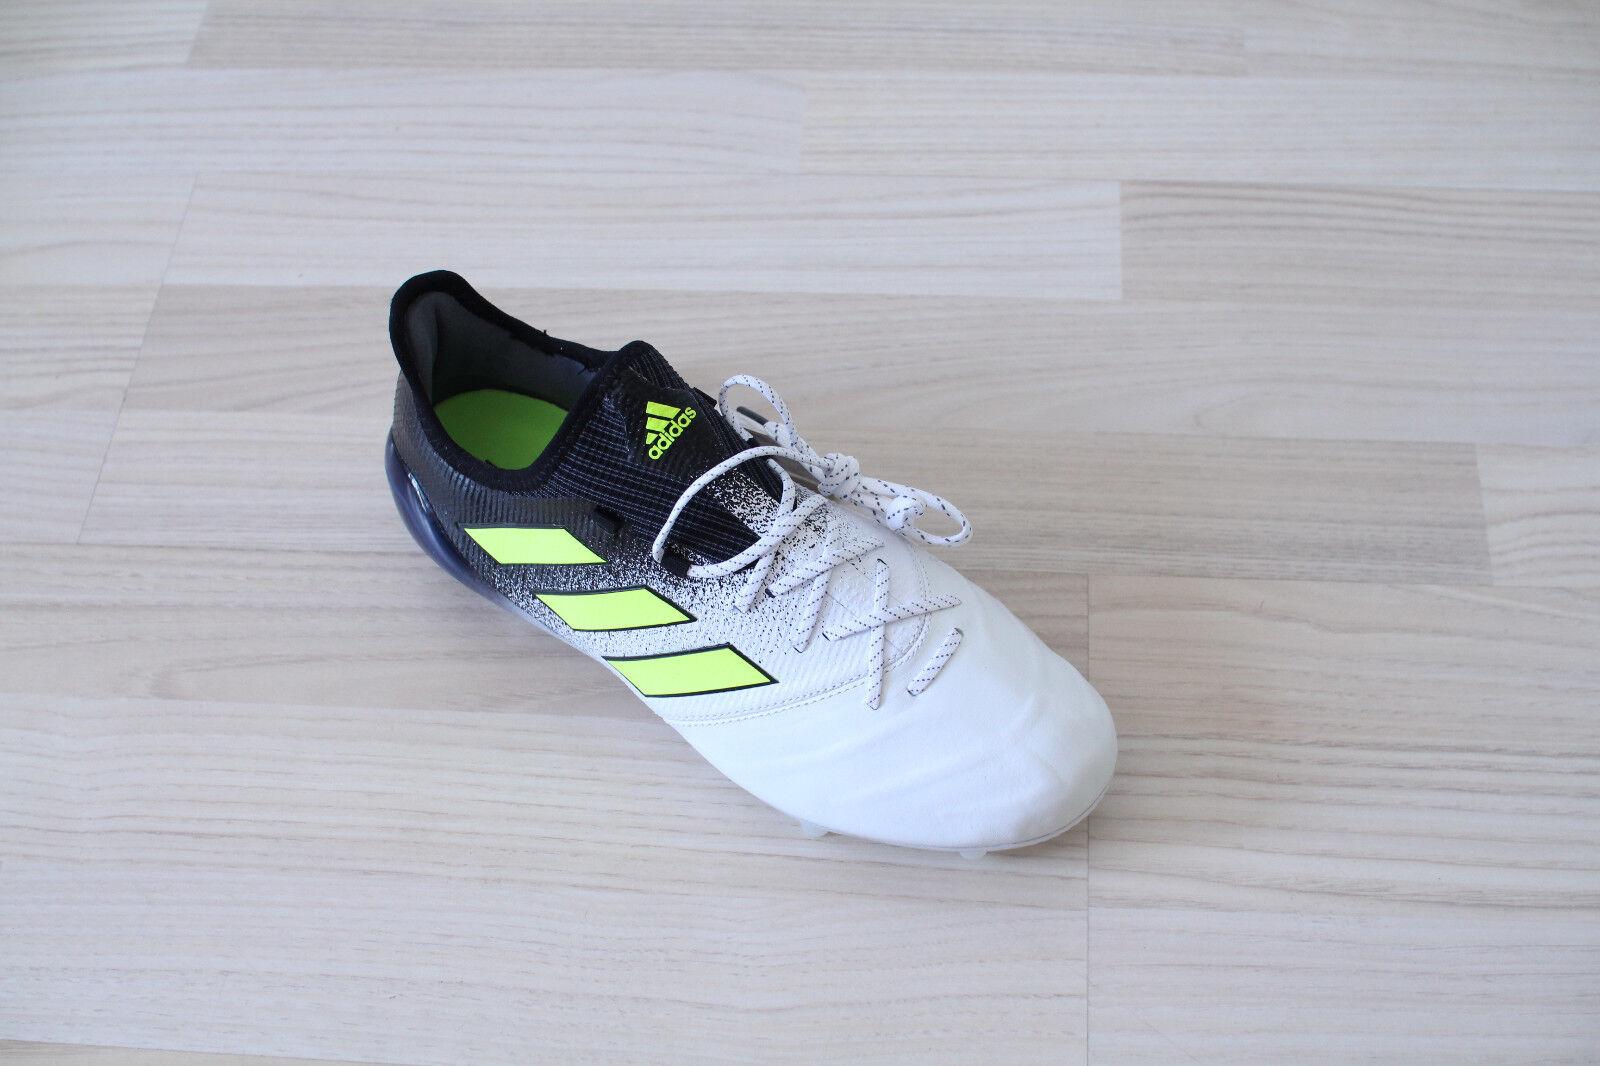 Adidas Ace 17.1 17.1 17.1 FG Leather Schwarz Weiß Gr. 40,41,42,43,44,45,46,47,48 S77041 85d03d